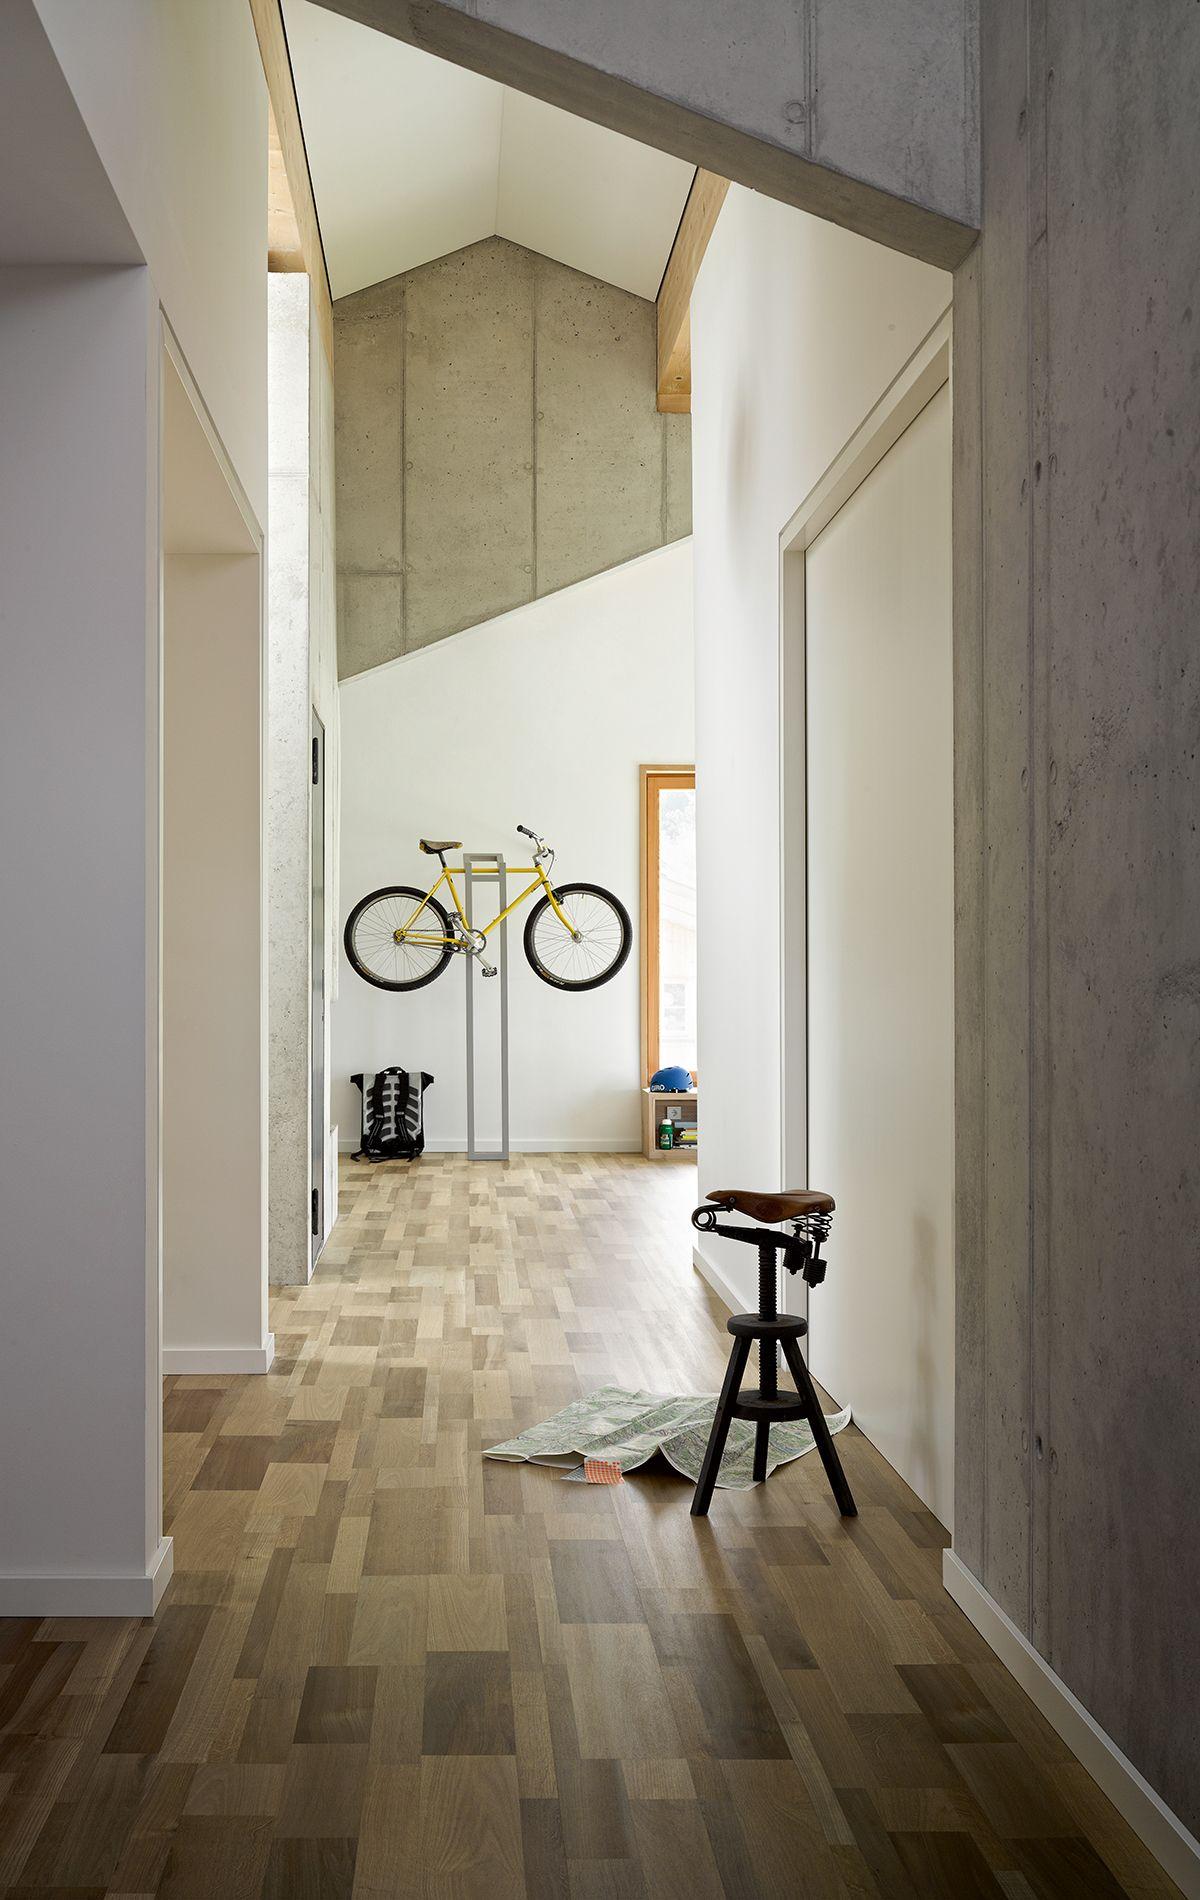 parador laminat eiche mix parador eiche laminat mix holzboden v parkett laminat und. Black Bedroom Furniture Sets. Home Design Ideas